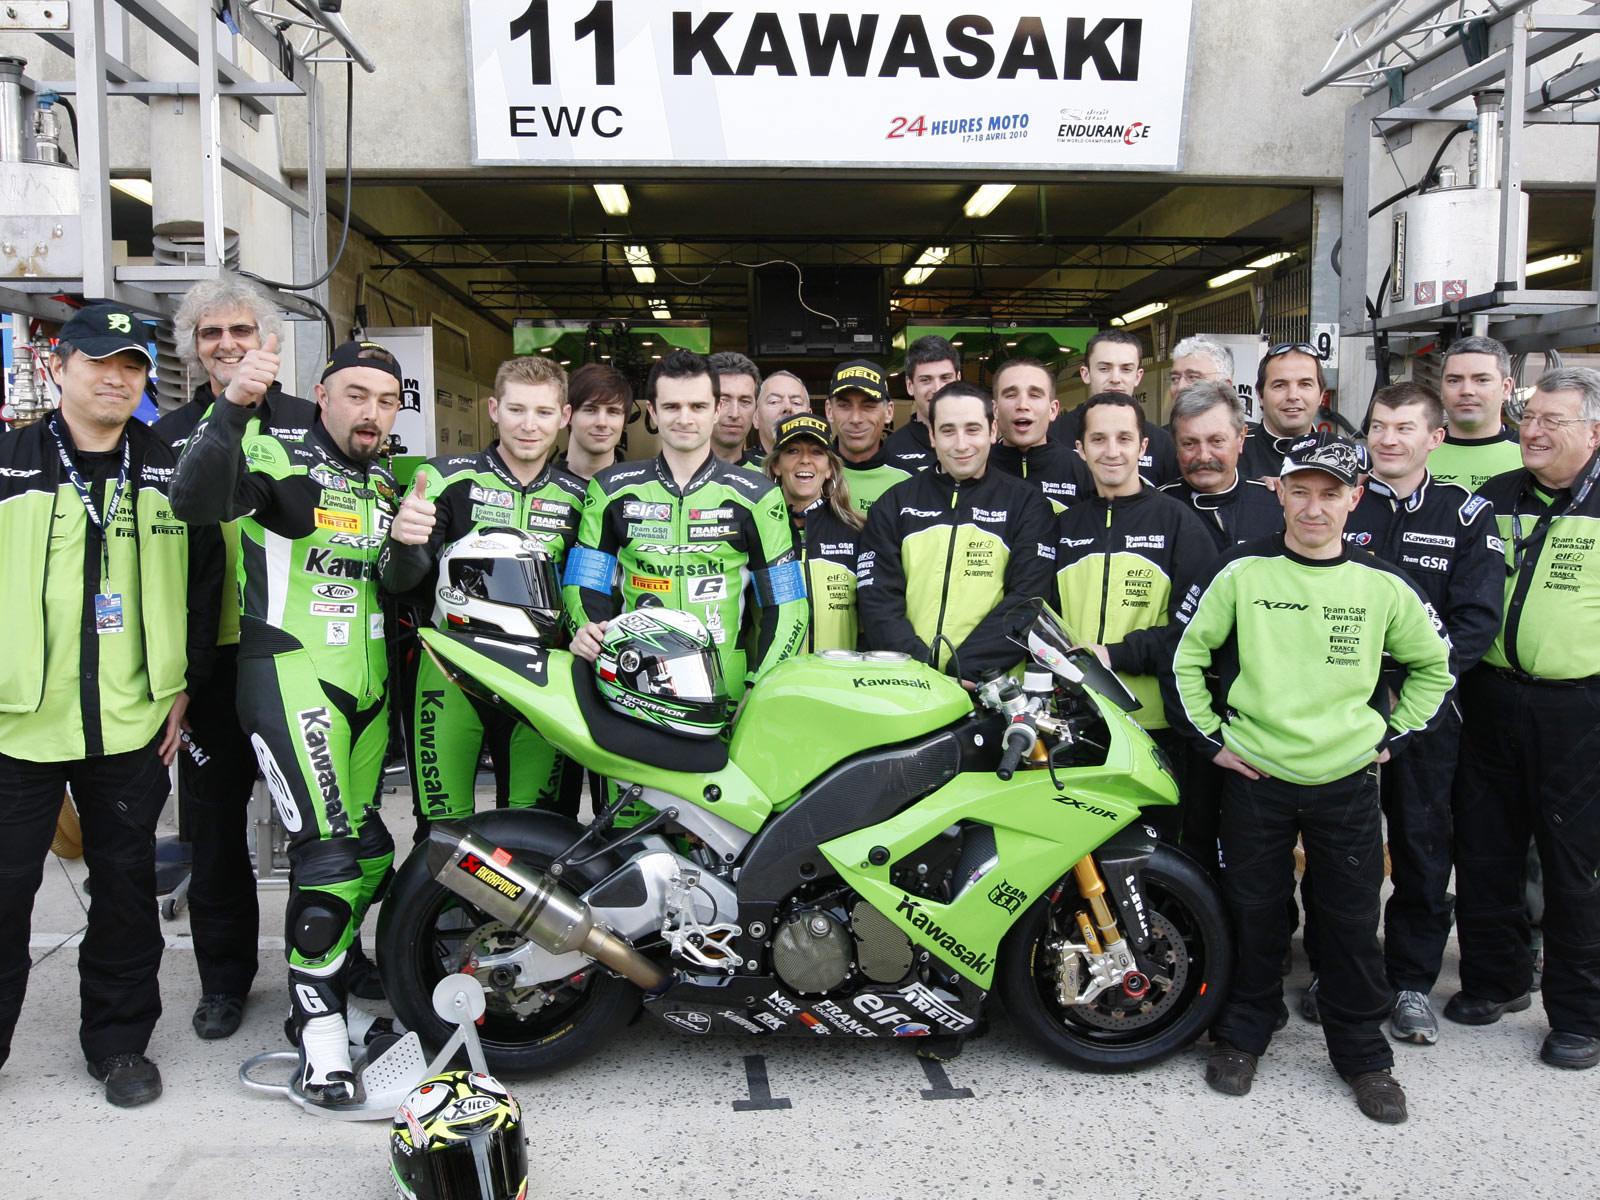 http://1.bp.blogspot.com/_ja0nvj5Jato/S-LR8vQyUiI/AAAAAAAAG3o/wcqK1DUt5nY/s1600/Kawasaki_Ninja_ZX-10R_wins-24-Hours-of-Le-Mans_2010_5.jpg